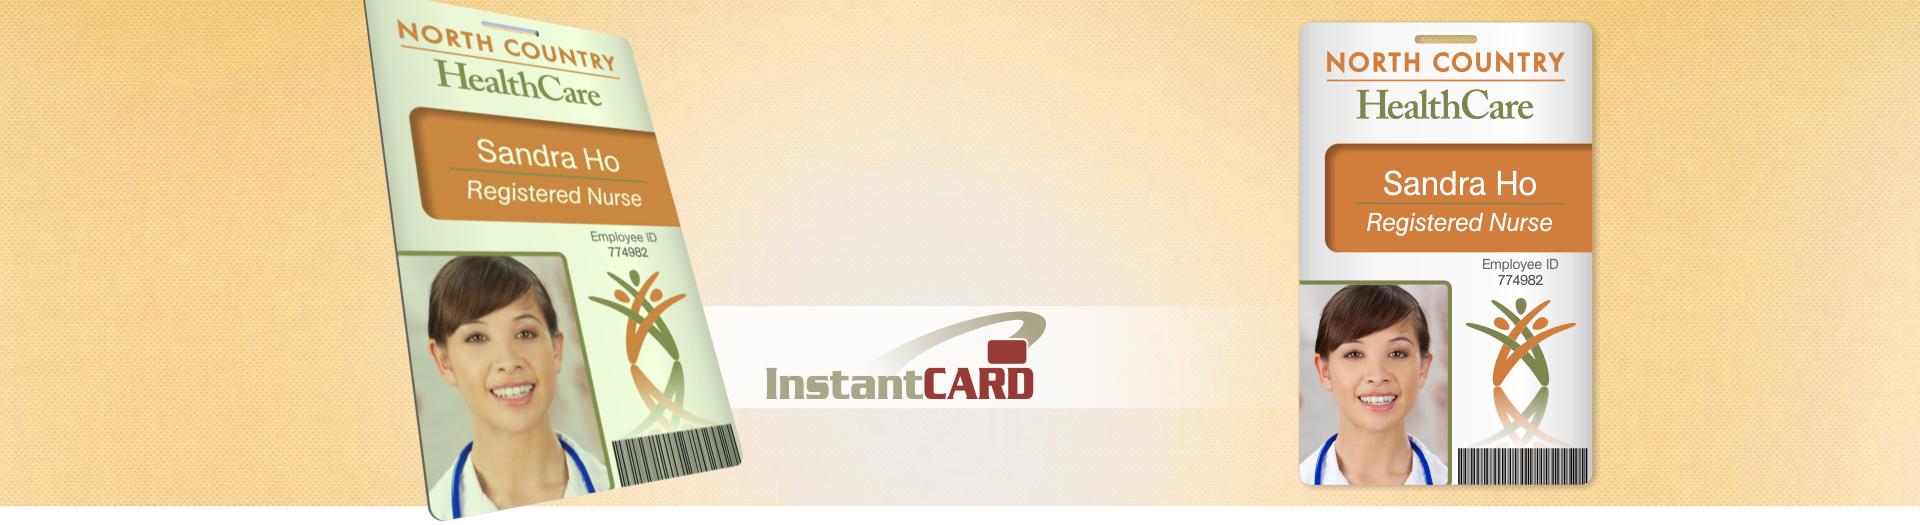 heath care id cards